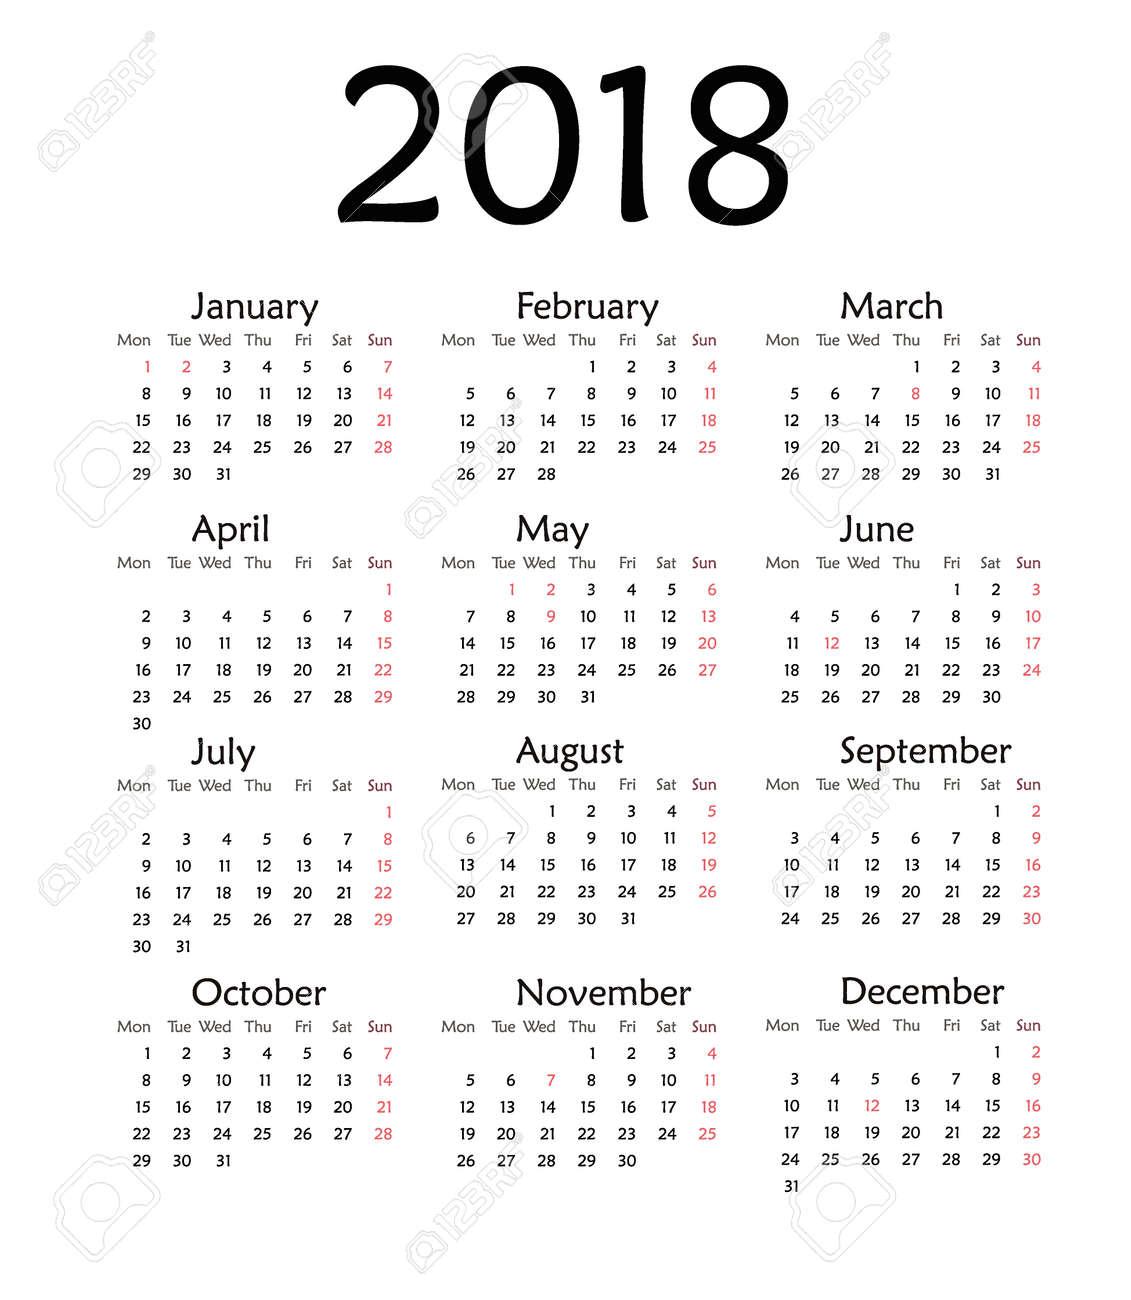 Simple calendar for 2018. Vector template design monthly date illustration 2018 calendar week organizer simple number. Organizer date 2018 year calendar month business template design. - 63656598